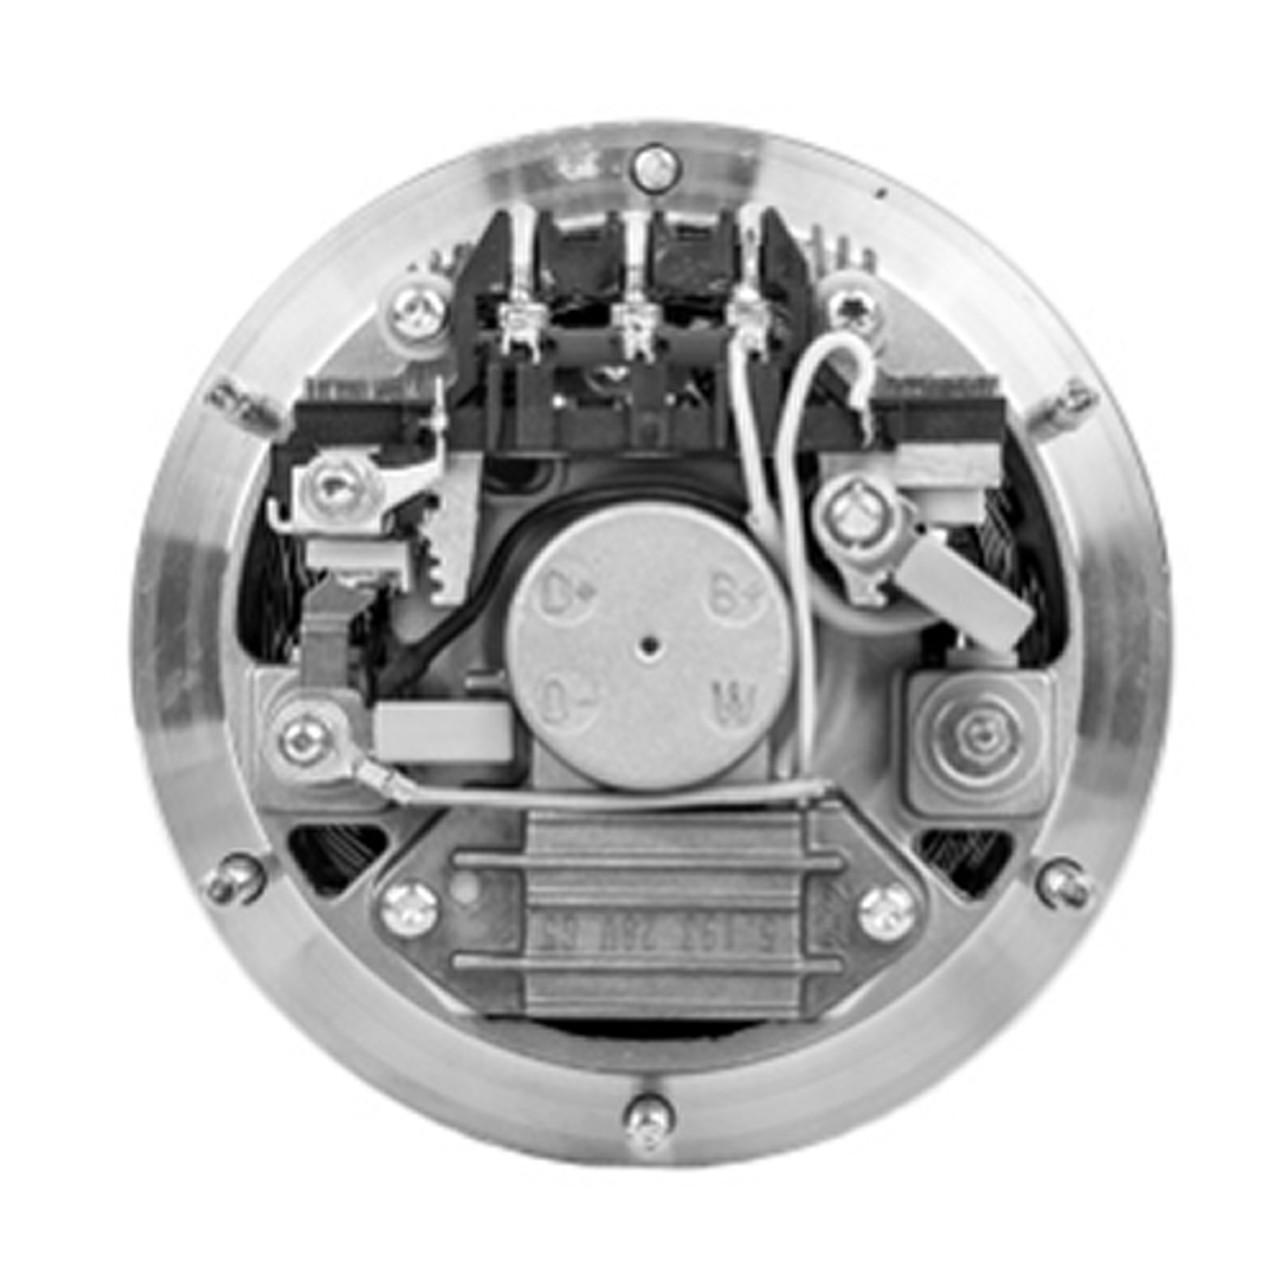 MG263 Letrika 24v 40 Amp Alternator Hatz sel on